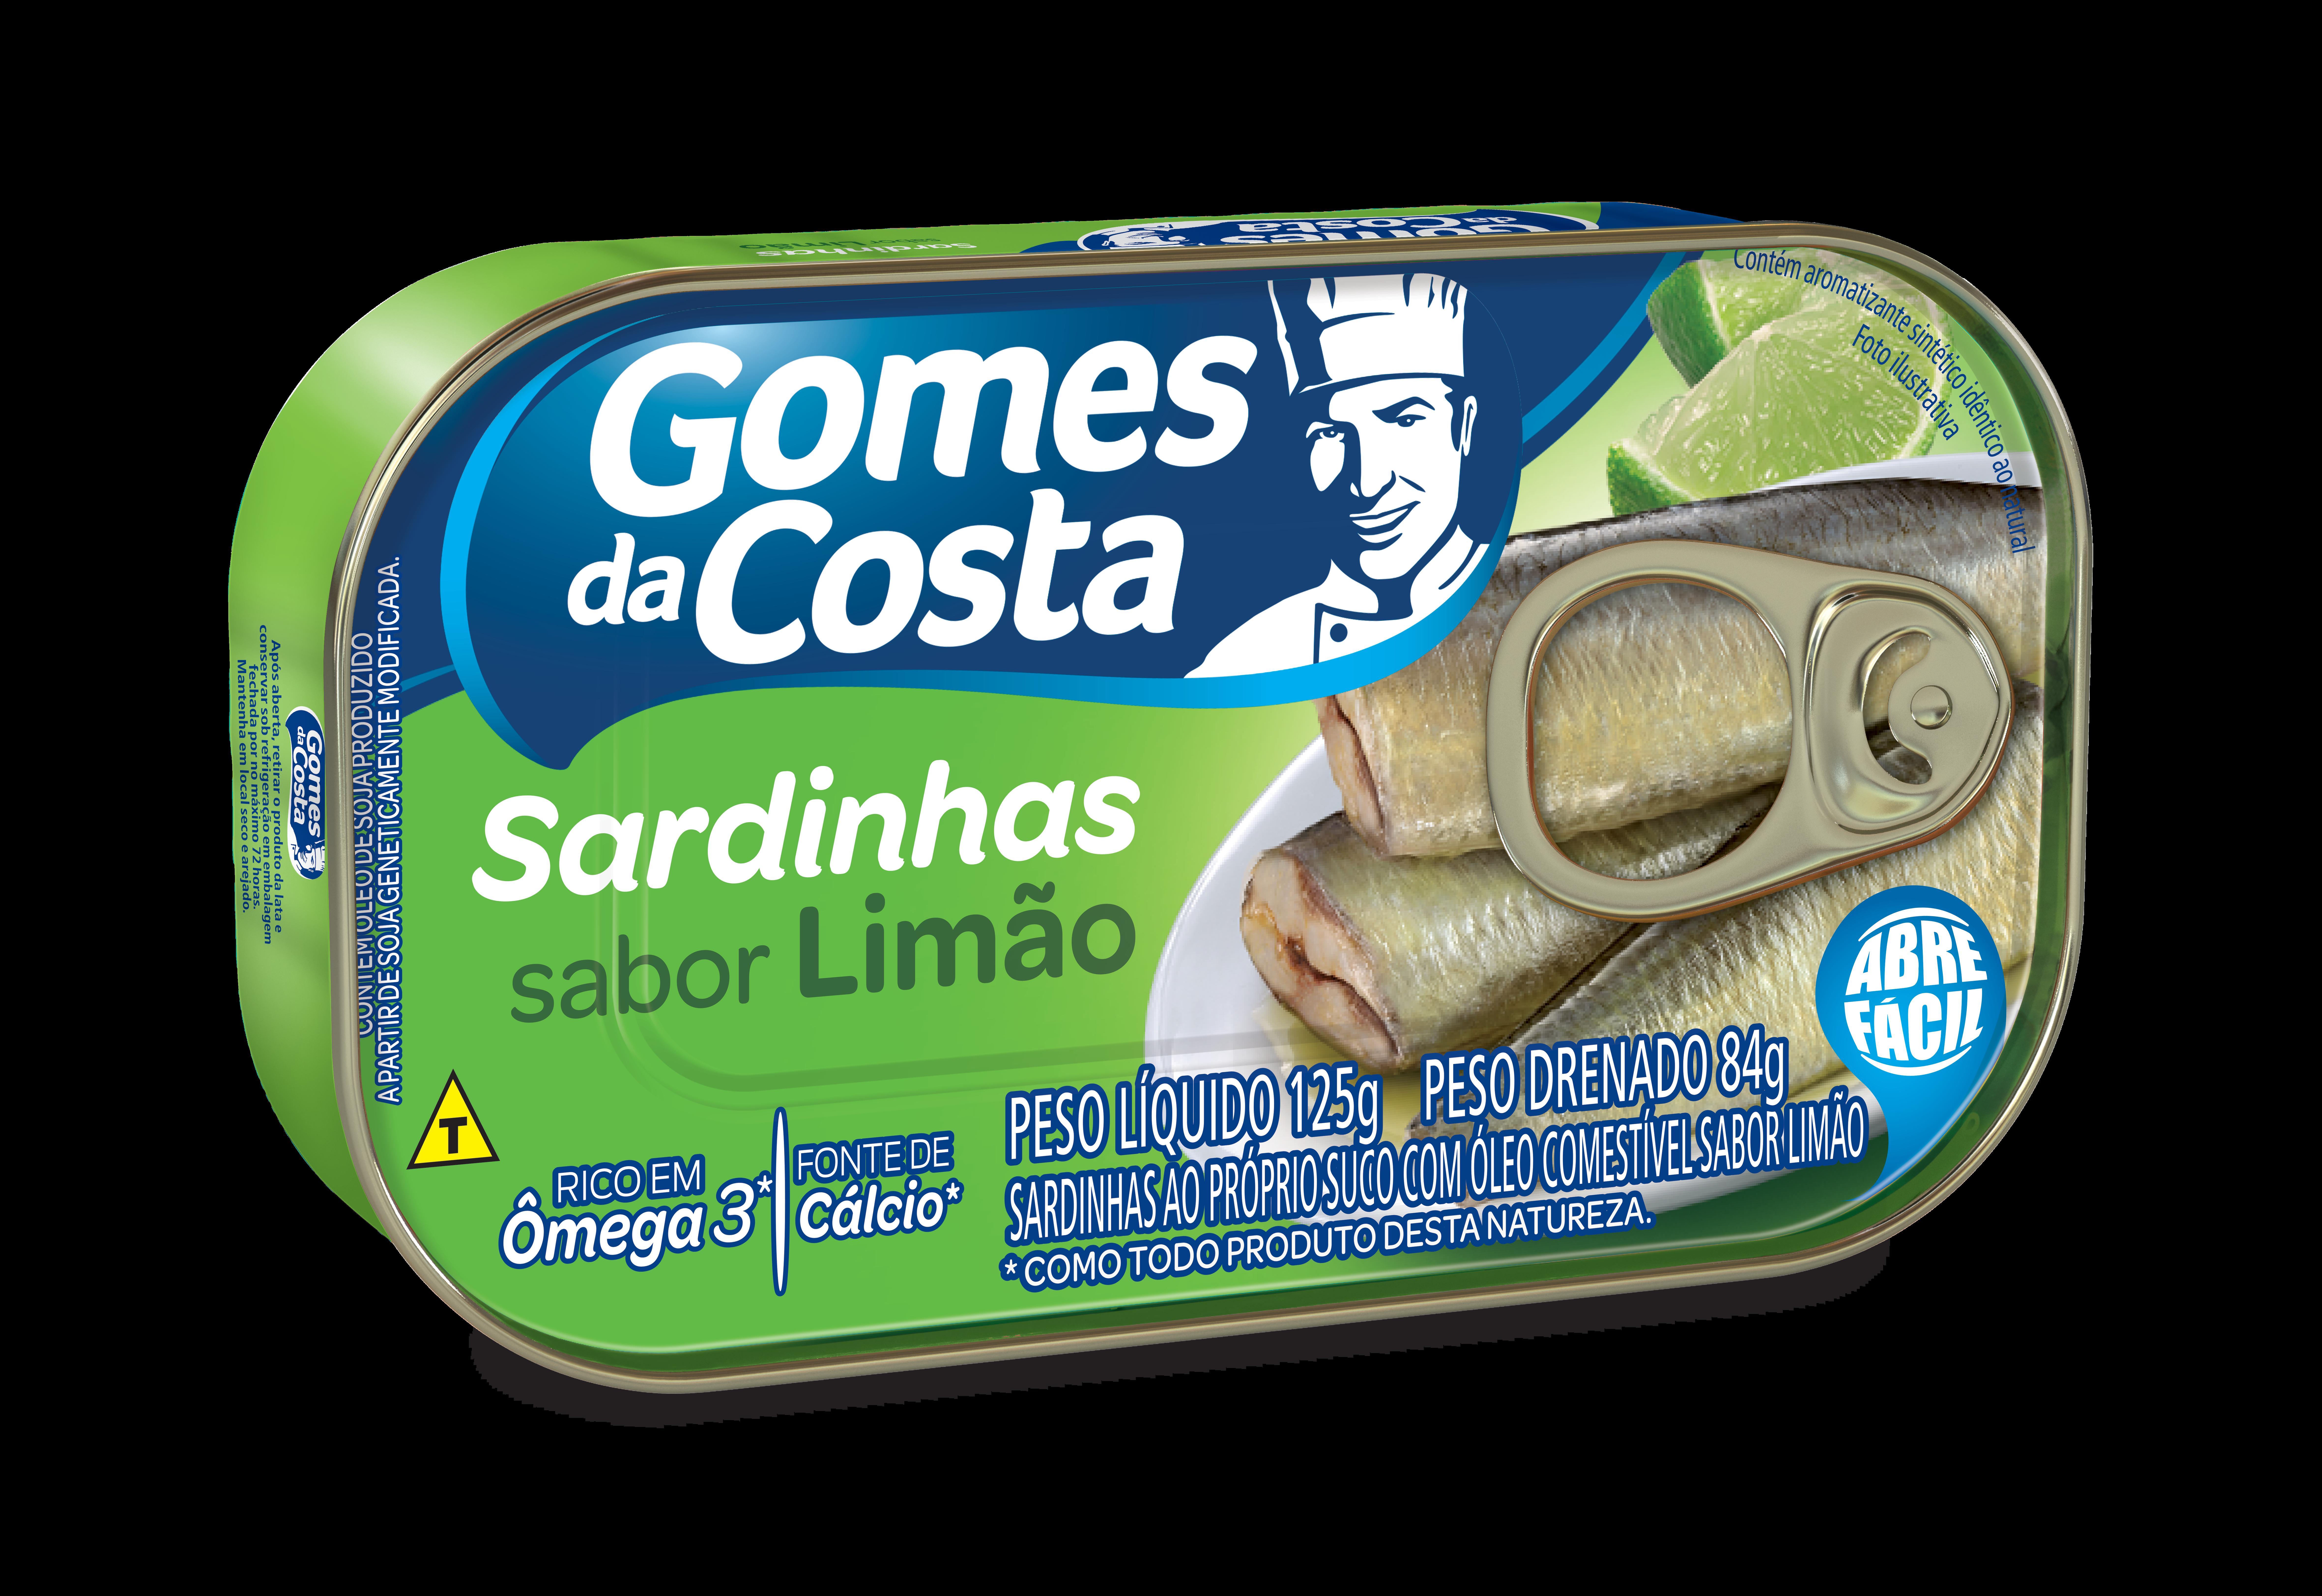 SARDINHA GDC 125G OLEO SABOR LIMAO